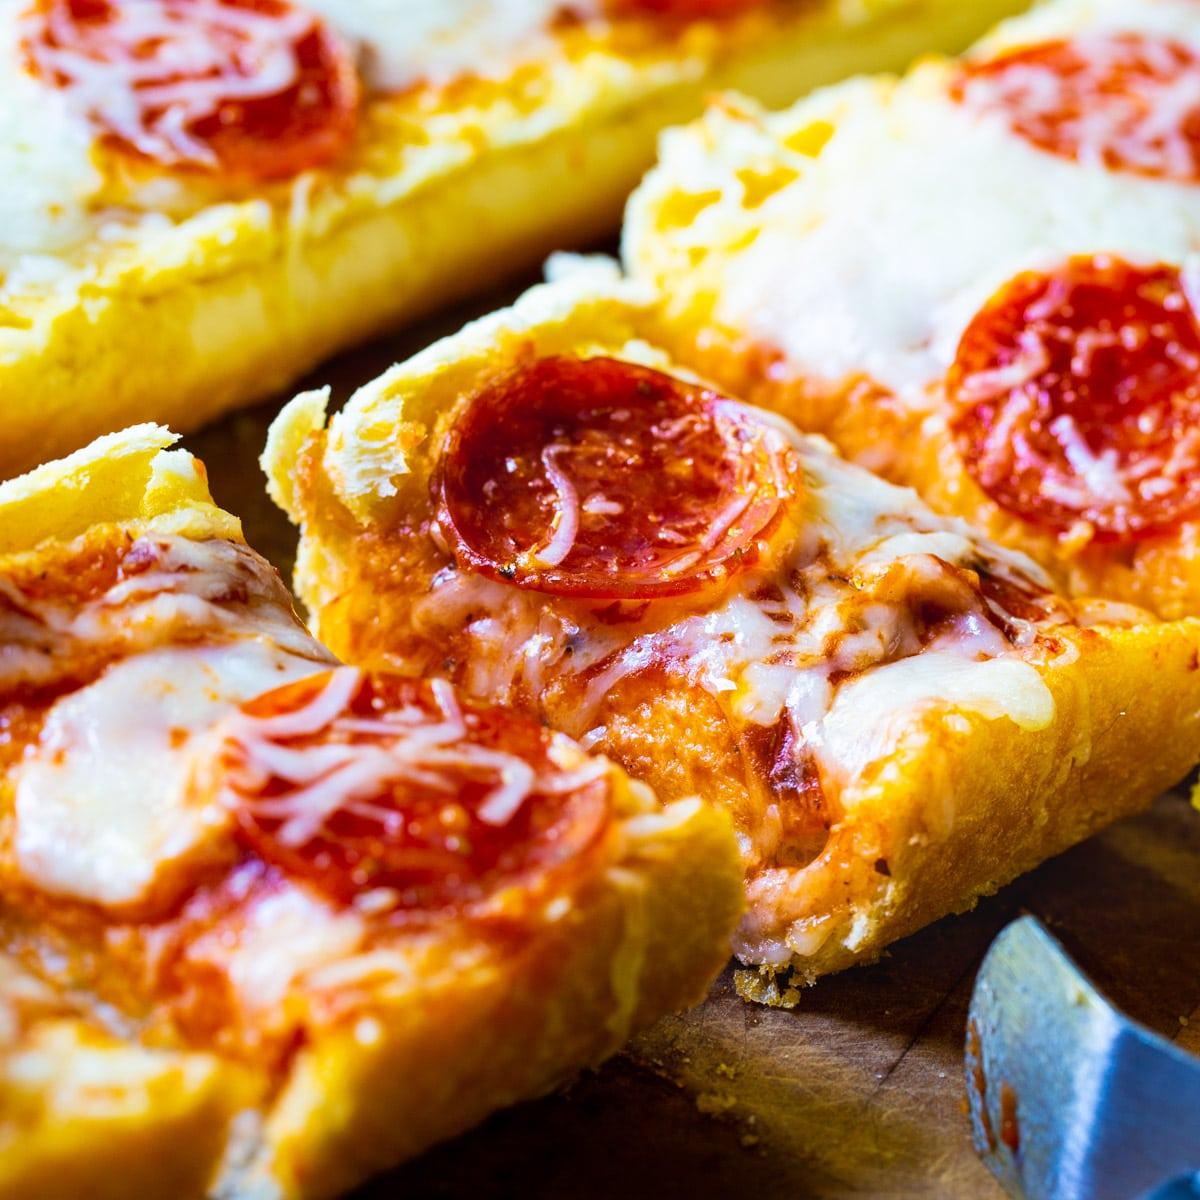 Garlic Bread Pizza cut into slices.